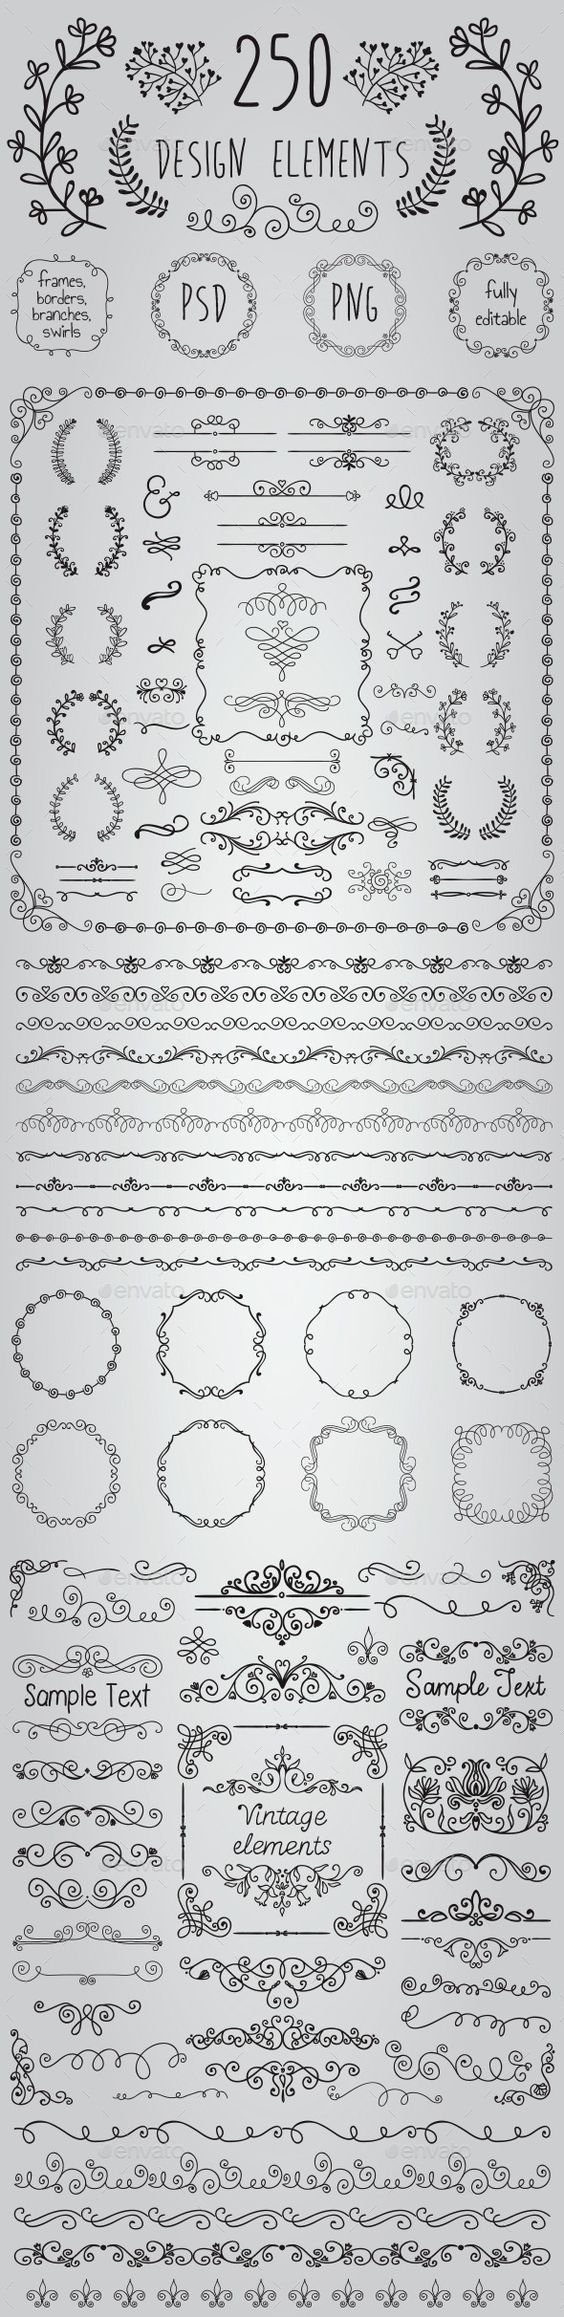 Big Set of 250 Handsketched Design Elements (Transparent PNG, CS, 500x500, 6.9x6.9, banners, black, border, branch, bundle, clipart, congratulation, decoration, drawing, editable, elements, flourish, foliage, foliate, frame, greeting, hand drawn, invitation, laurels, leaves, ornaments, pack, rustic, sketch, wedding):